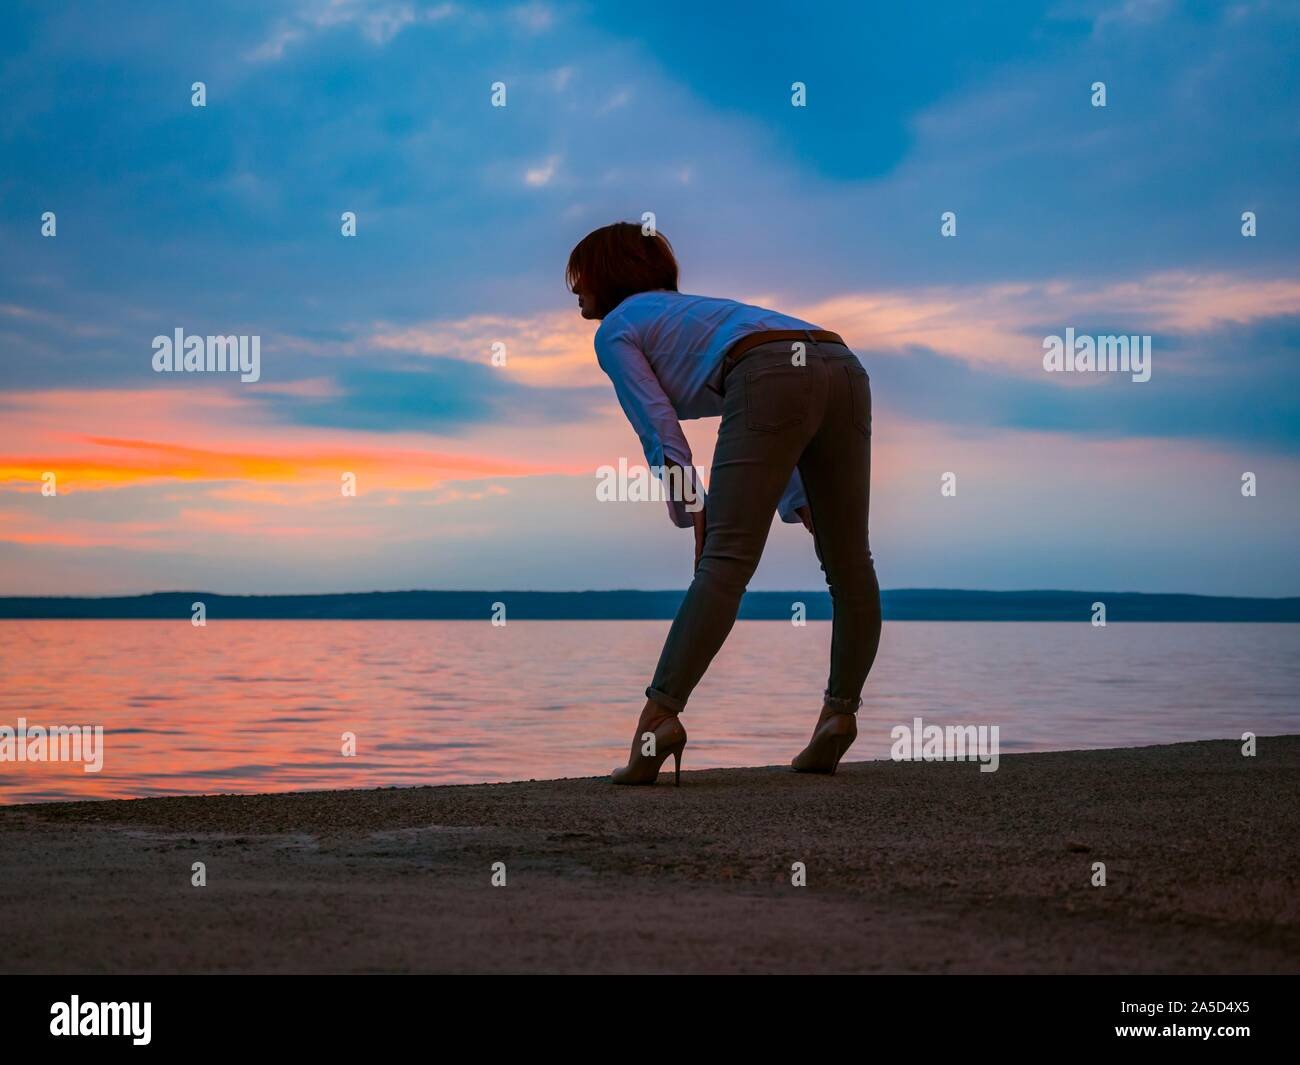 Post sunset waterfront attractive woman standing bending-over looking away spread legs wearing denim pants high-heels inviting sexual allurement Stock Photo